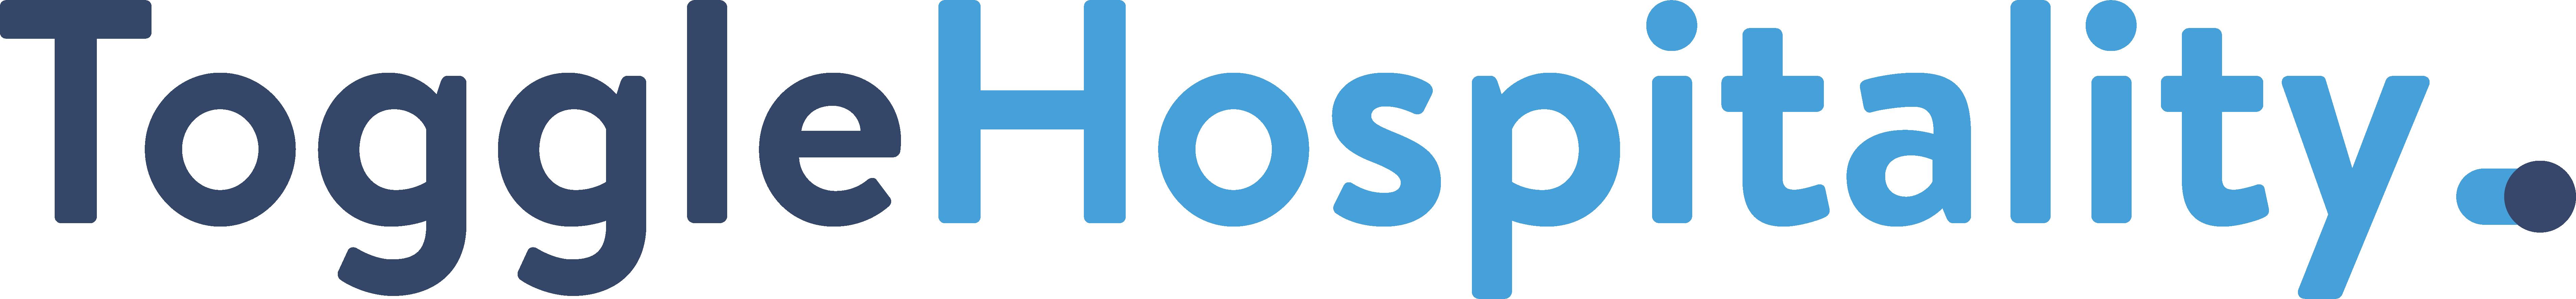 Toggle Hospitality logo